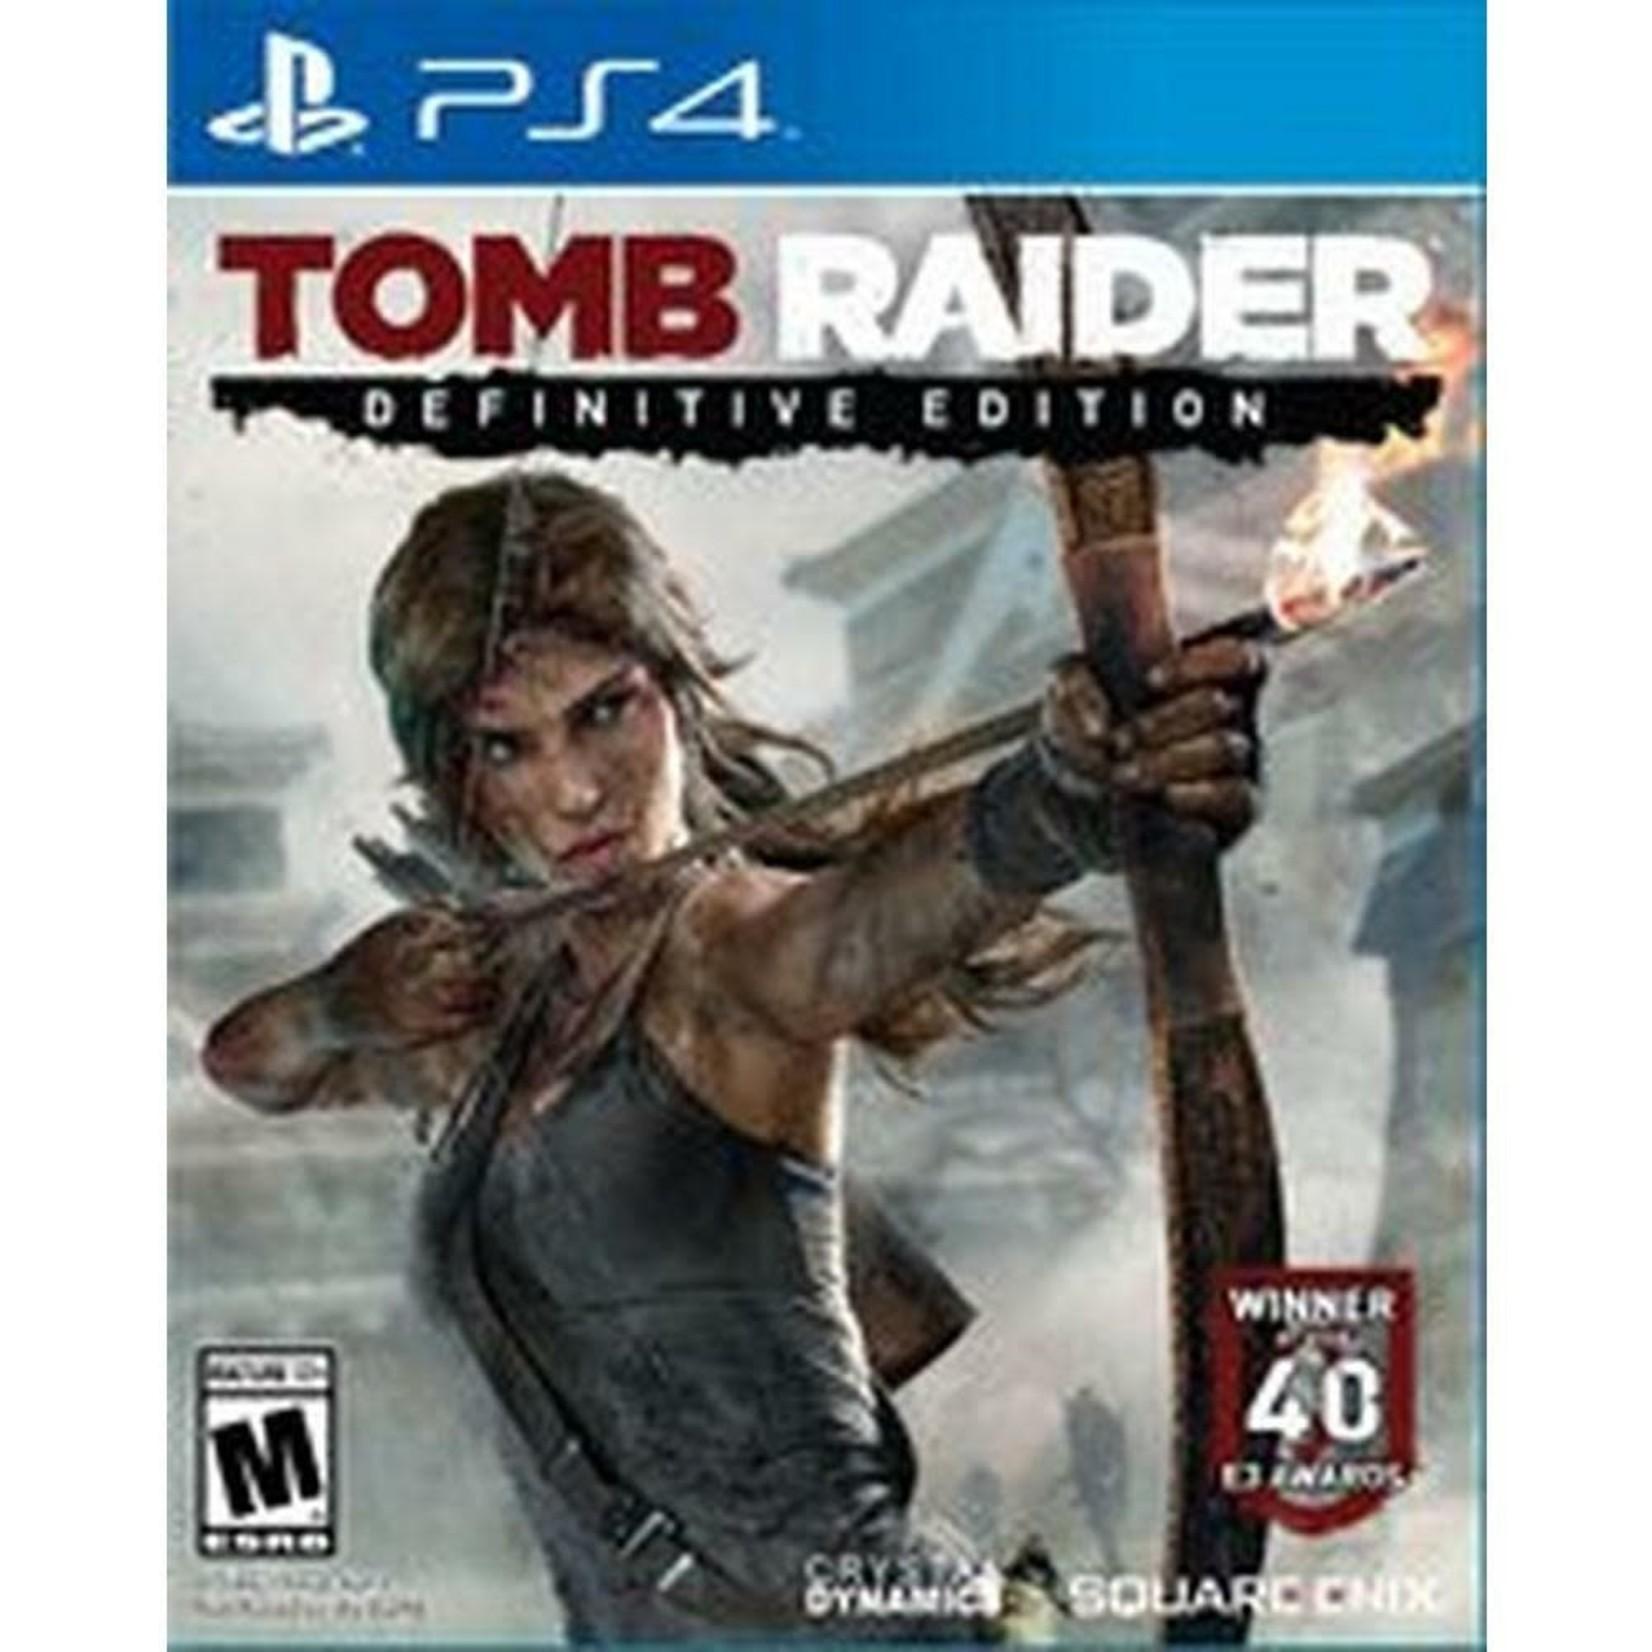 PS4U-Tomb Raider Definitive Edition